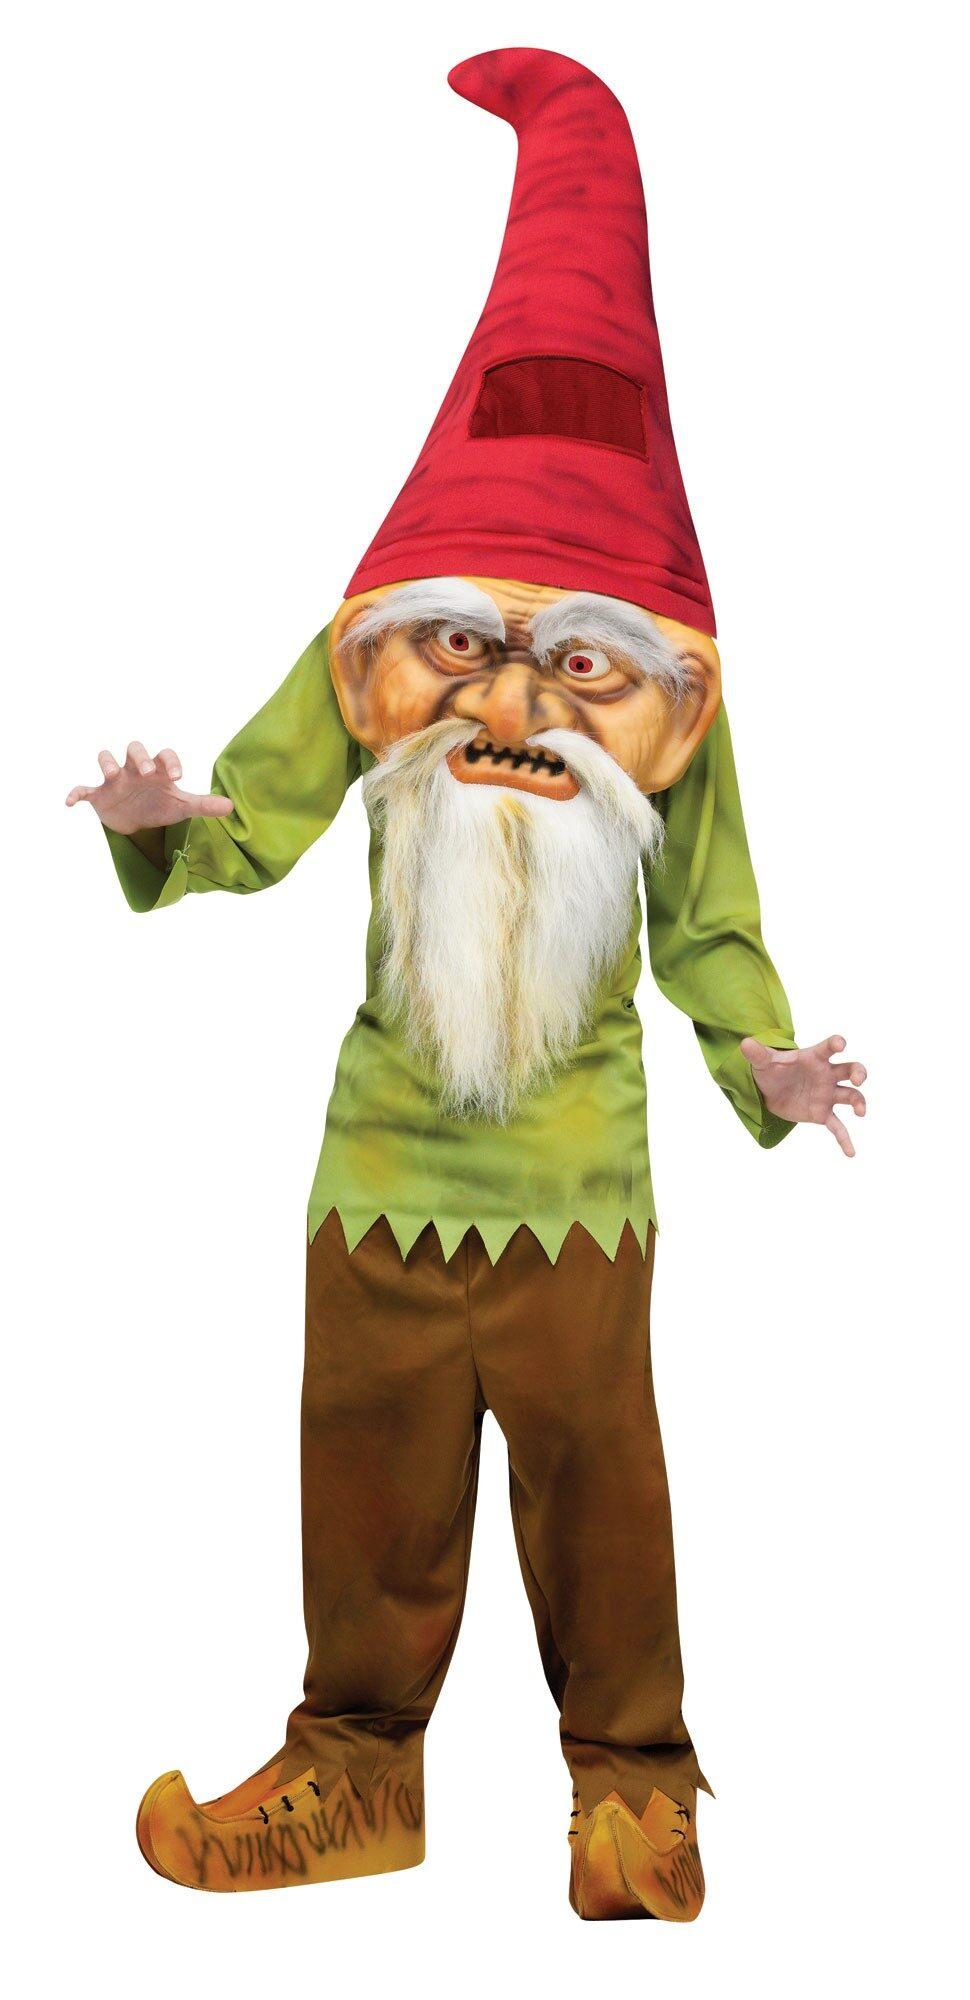 evil scary gnome kids costume mr costumes